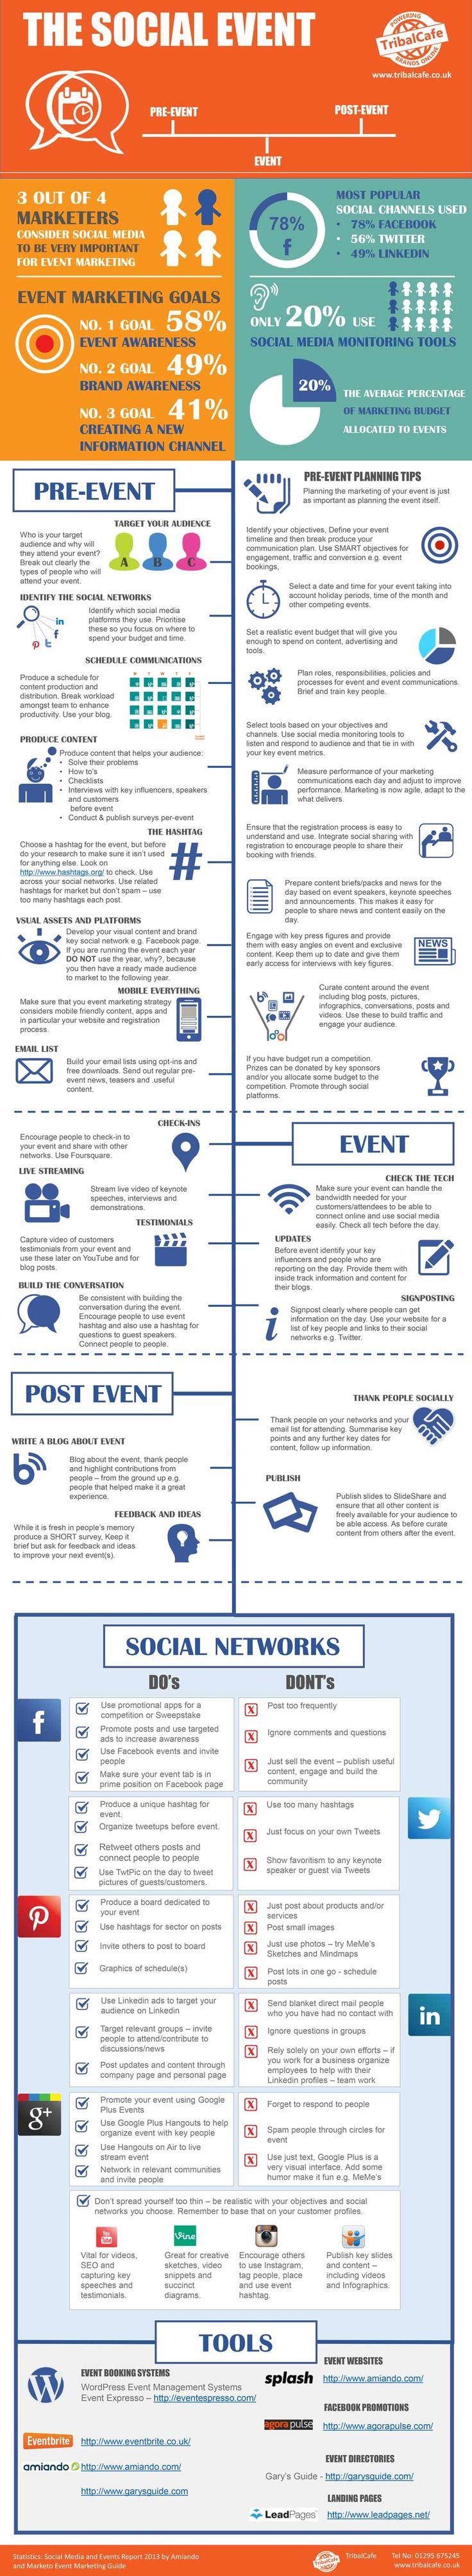 The Social Event Management #infographic #infografía